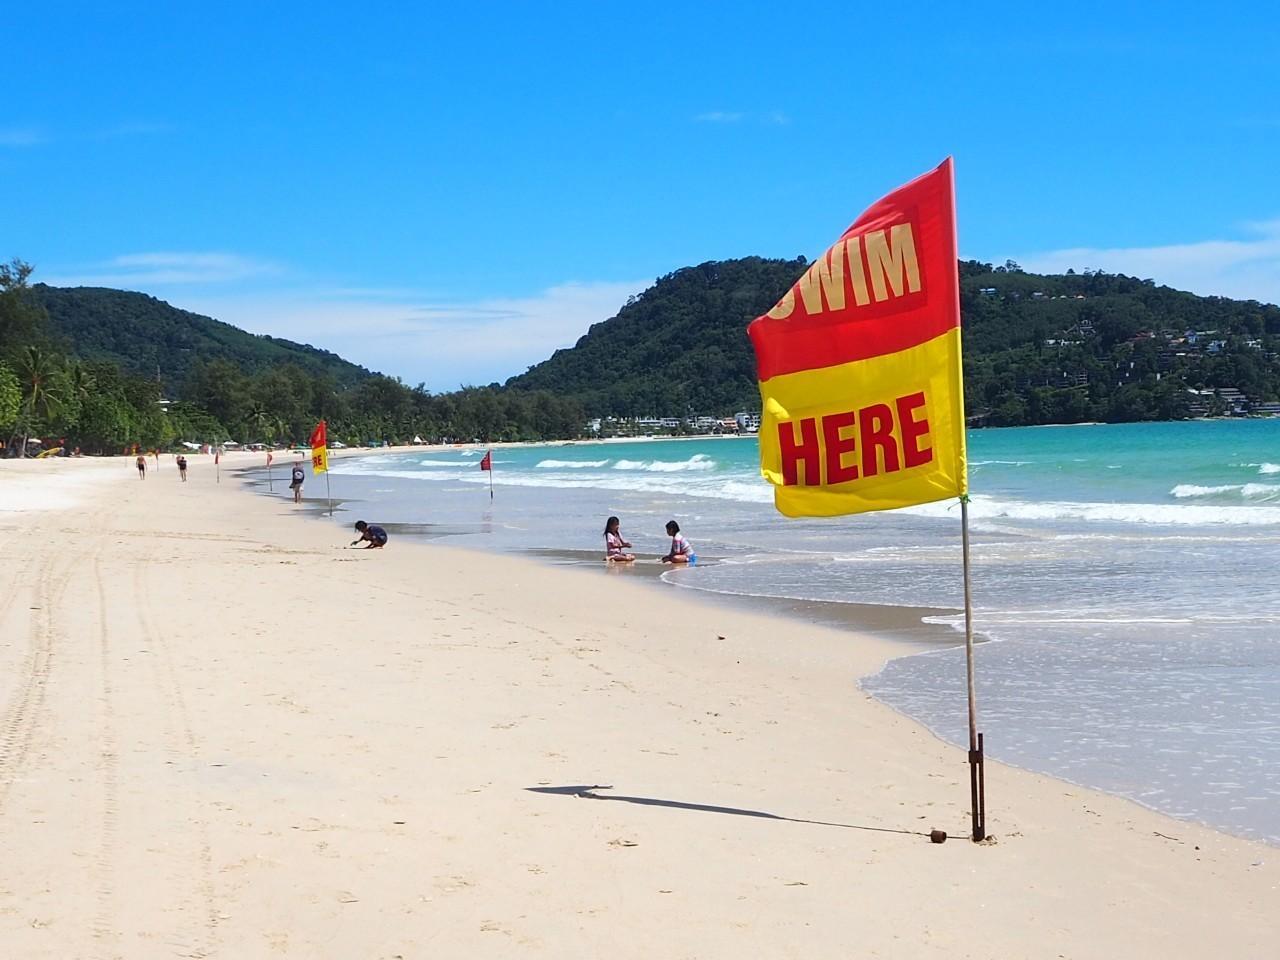 Patong beach in Phuket recently started to see a gradual increase in tourists thanks to the Phuket sandbox.Dusida Worrachaddejchai